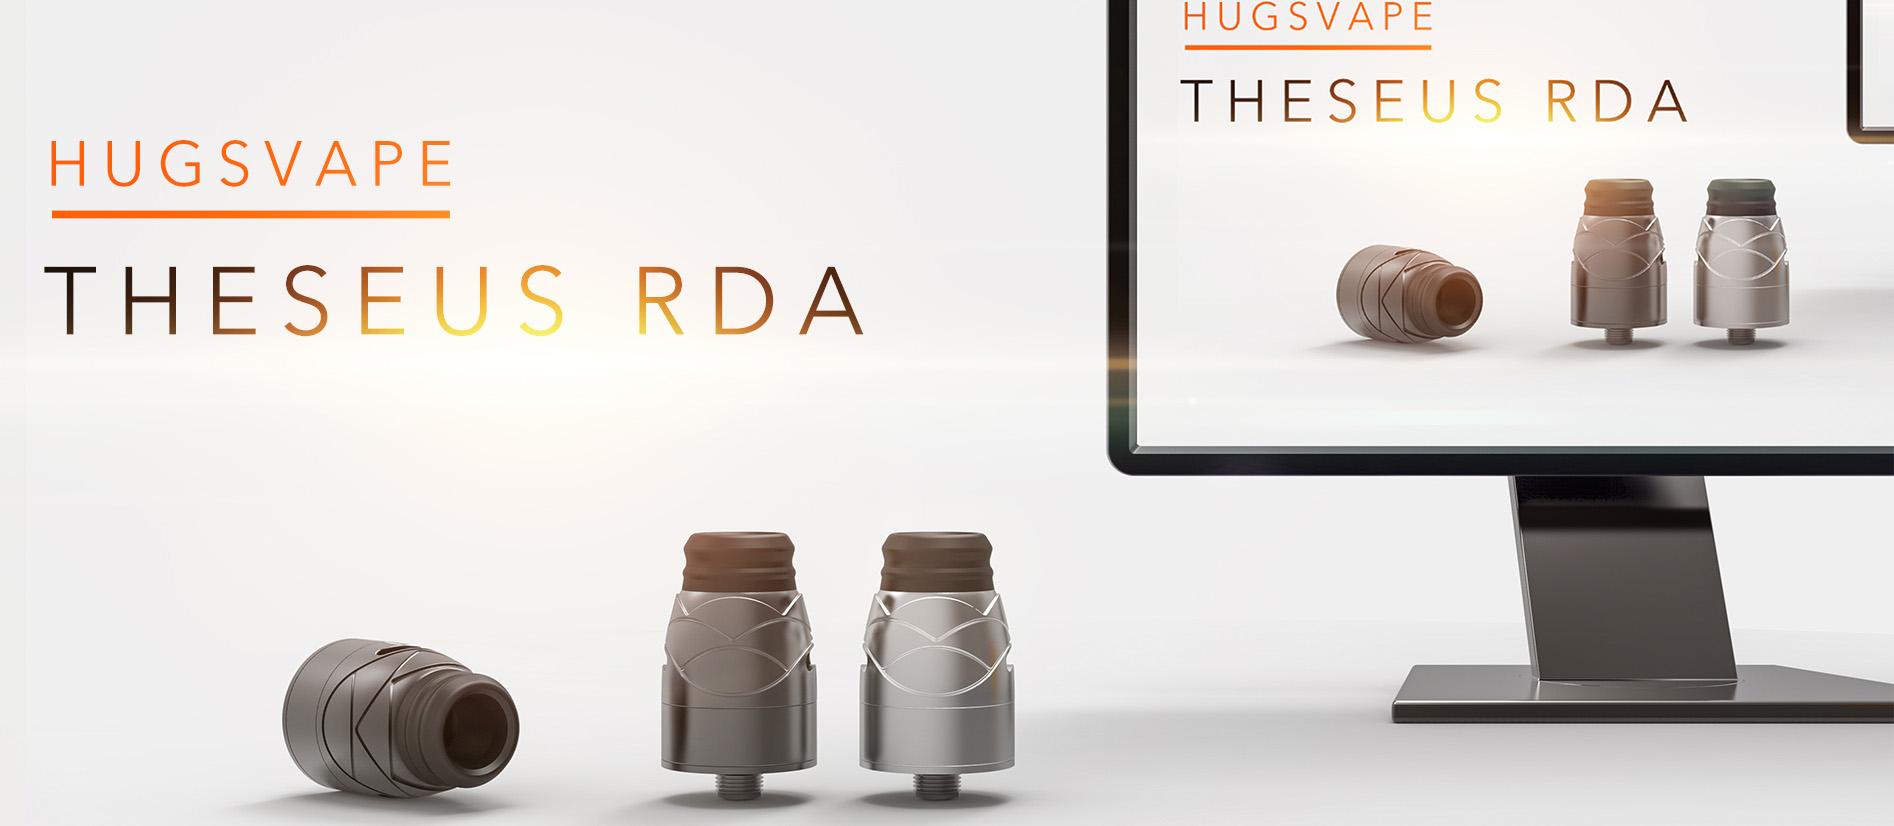 Hugsvape Theseus RDA Feature 1